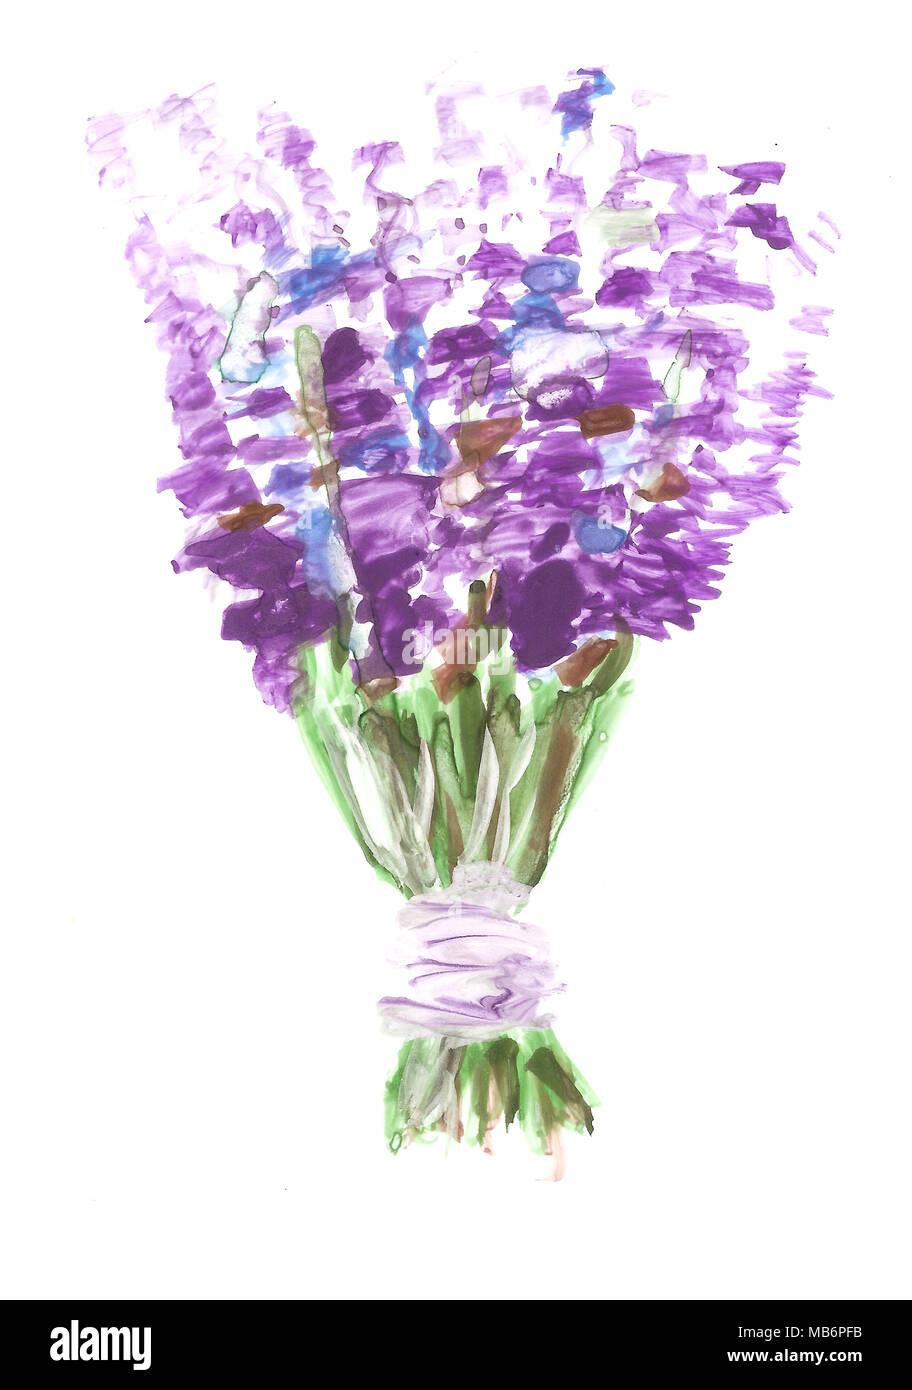 Handmade Watercolor Lavender Bouquet Stock Photo Alamy